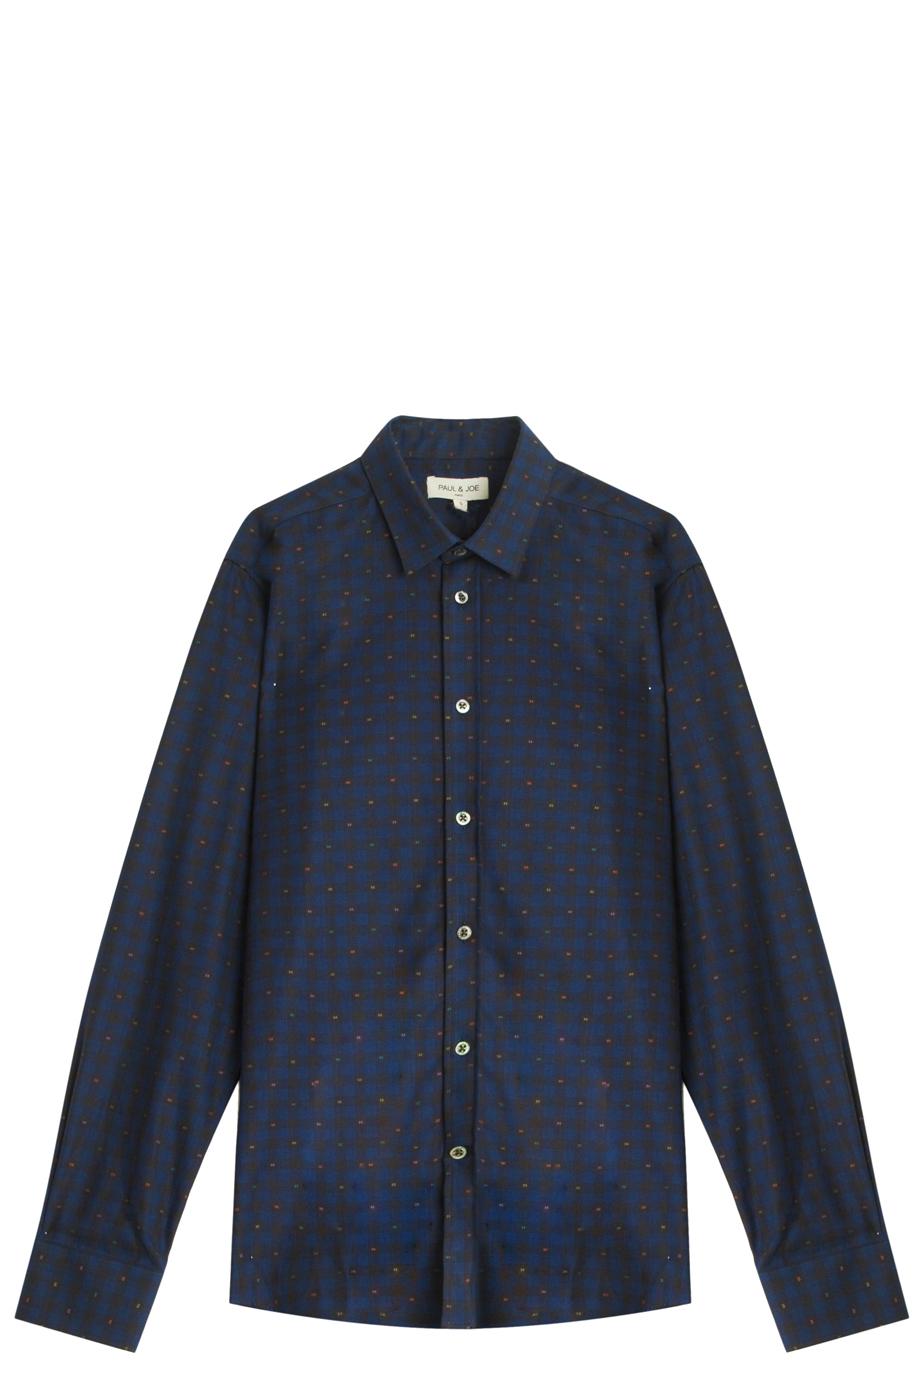 lyst paul joe check shirt in blue for men. Black Bedroom Furniture Sets. Home Design Ideas